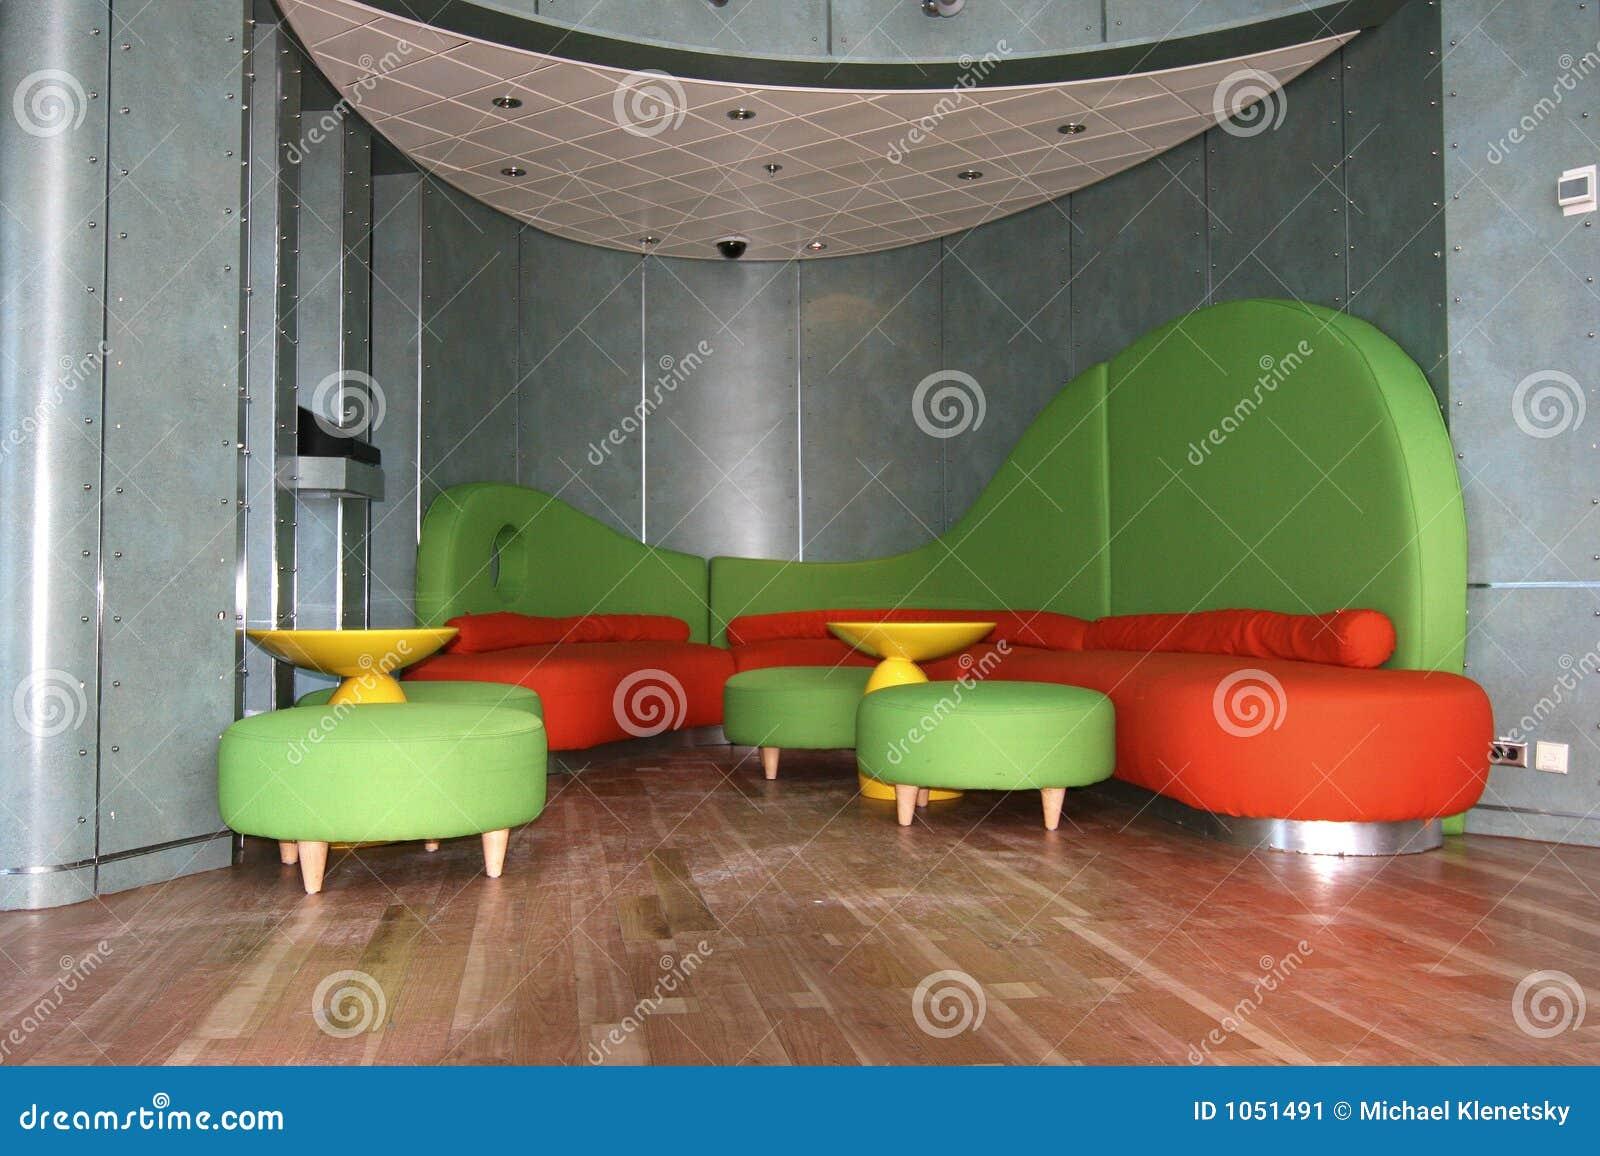 Retro Furniture Stock Image Image 1051491